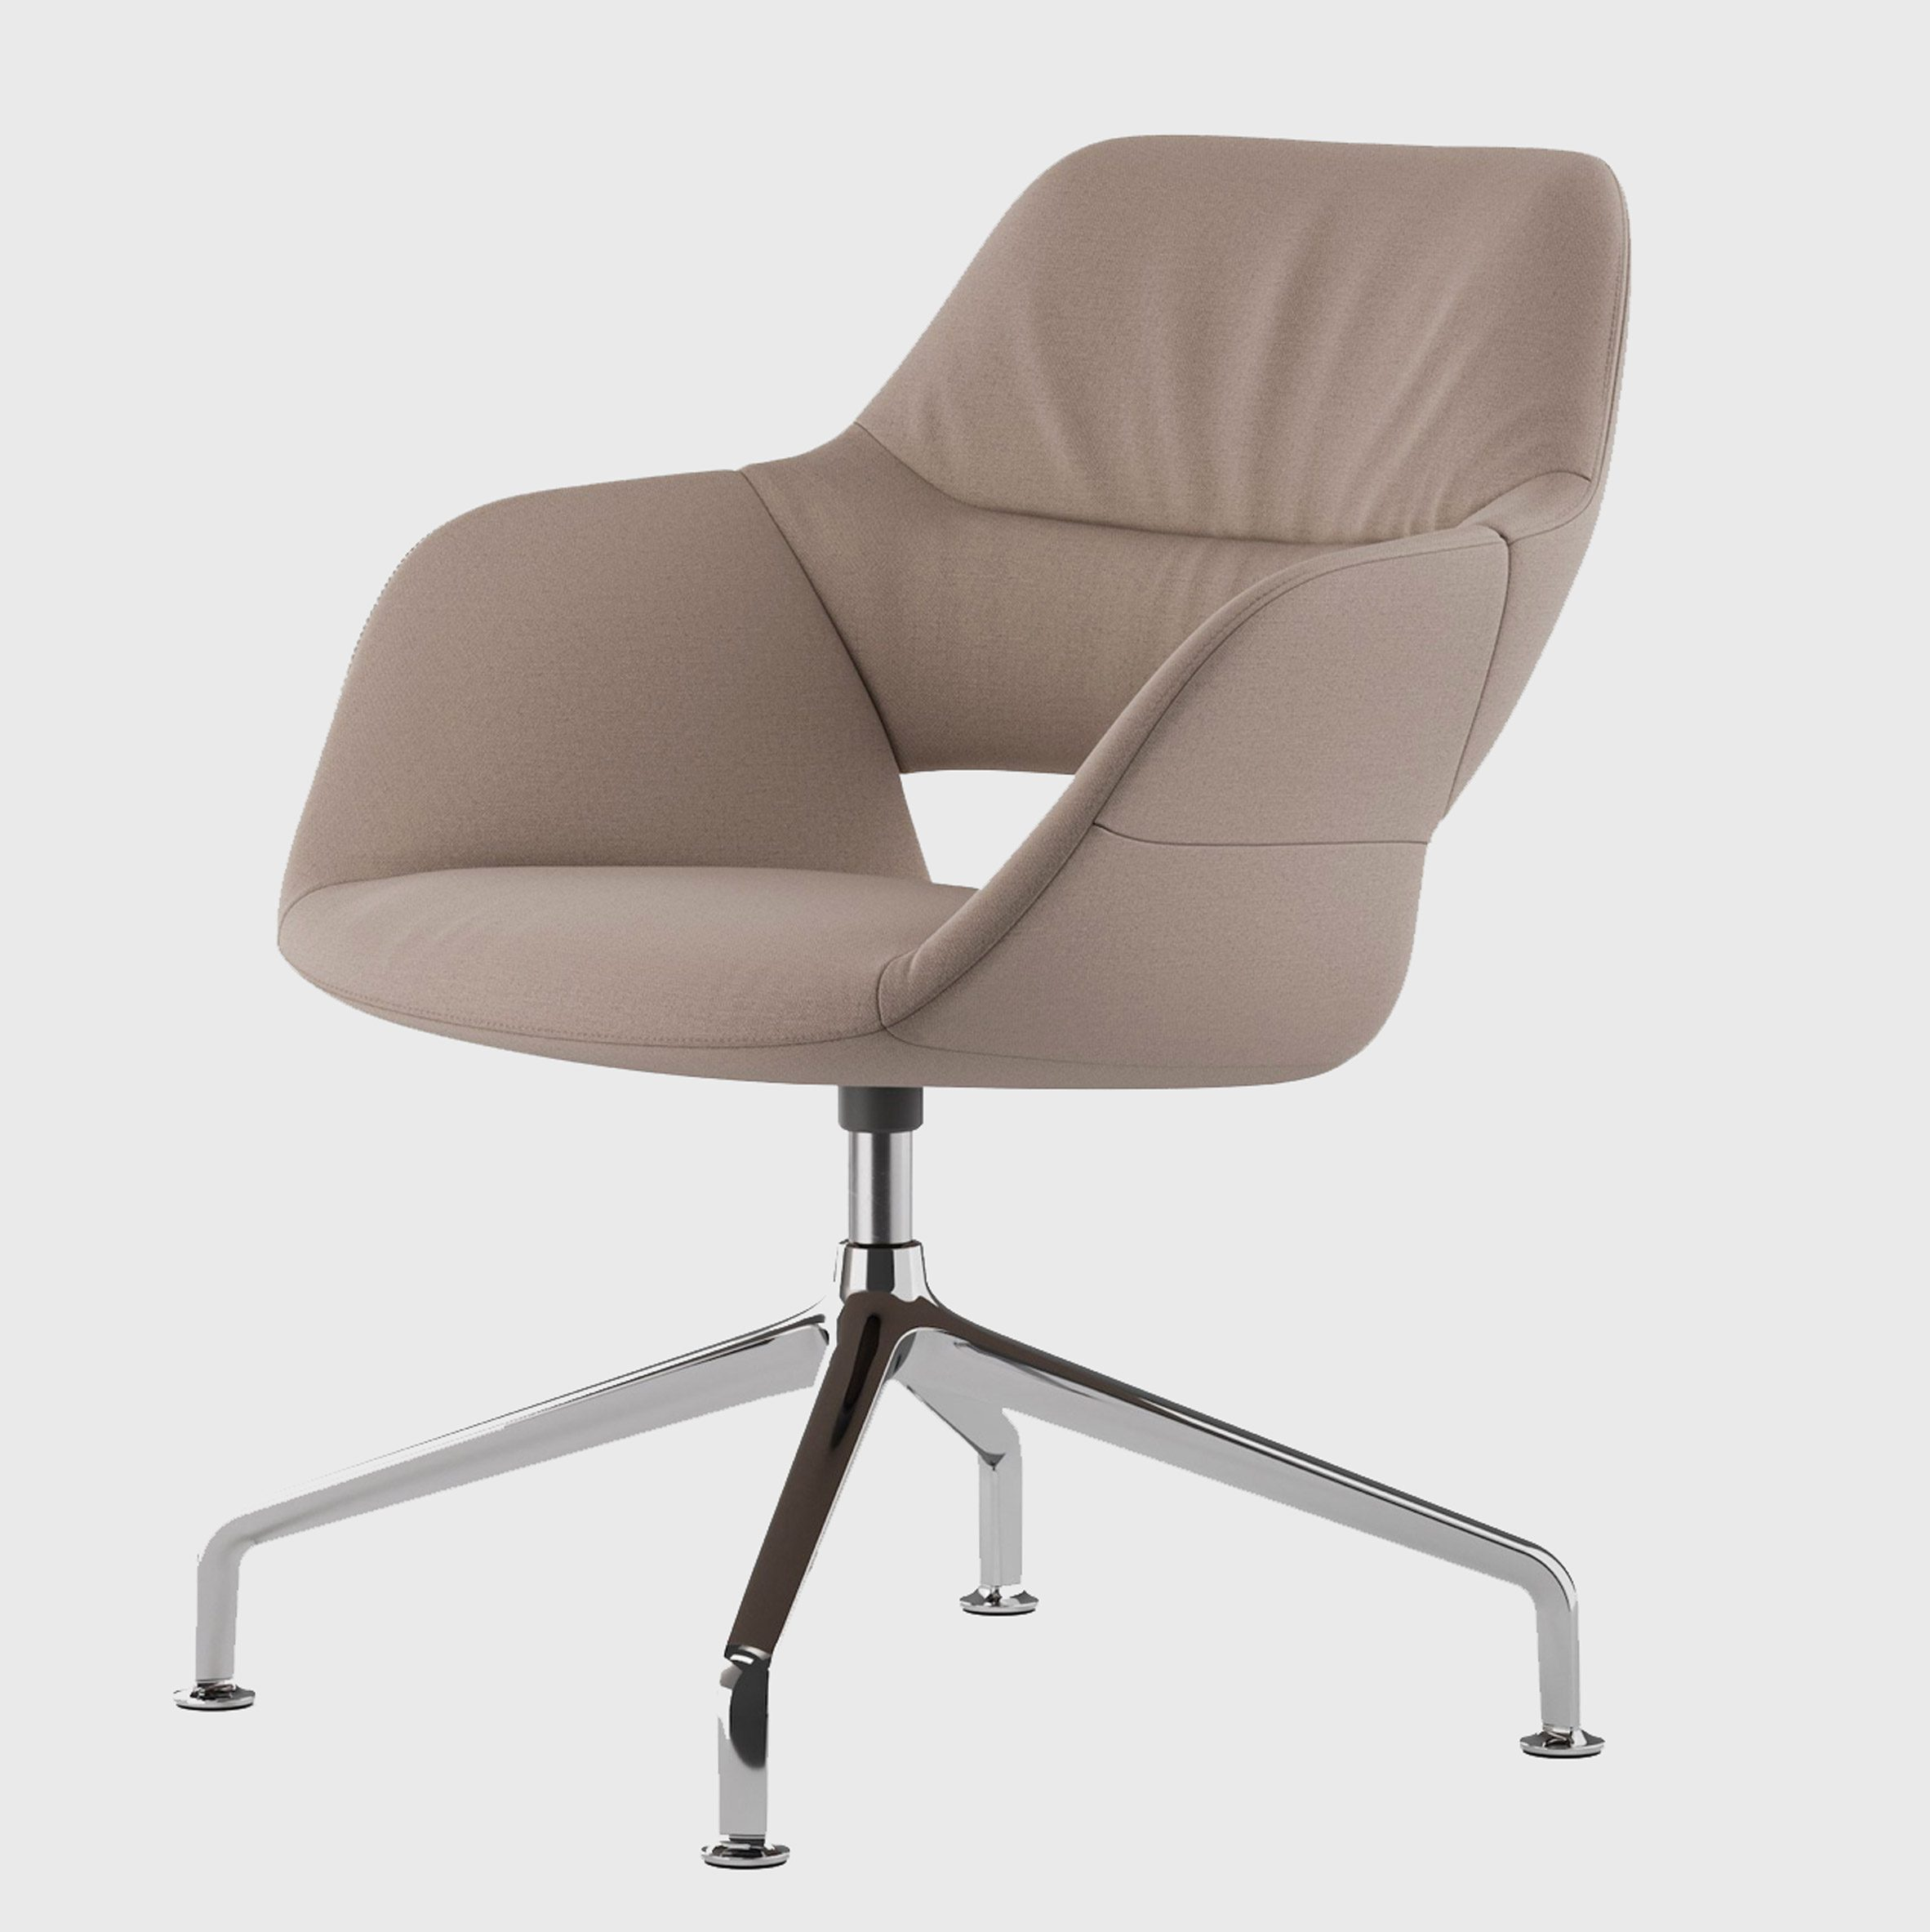 Кресло Occo от Jehs + Laub для Wilkhahn